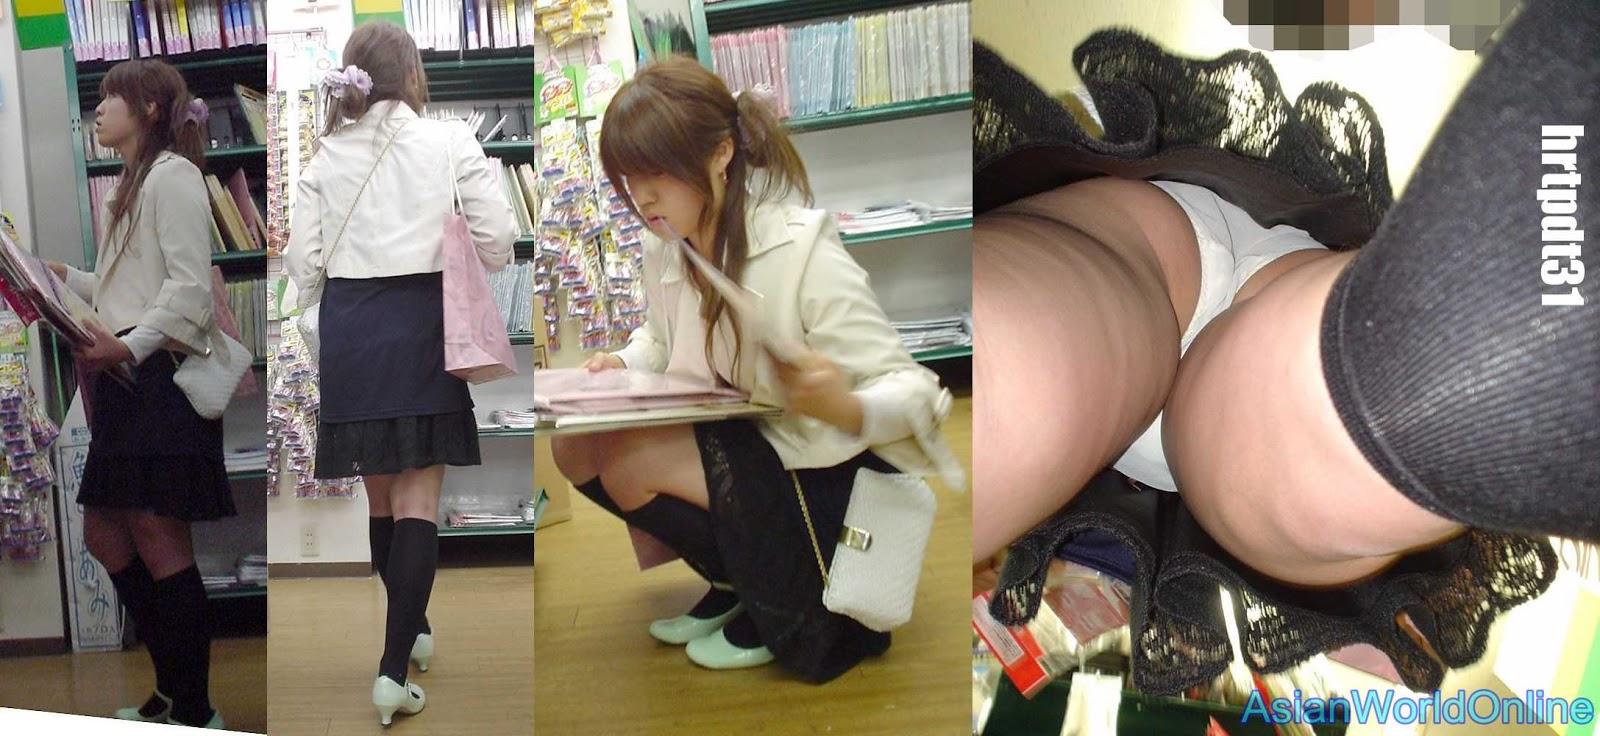 2 japoneses schoolgirls upskirt with nice panties 7